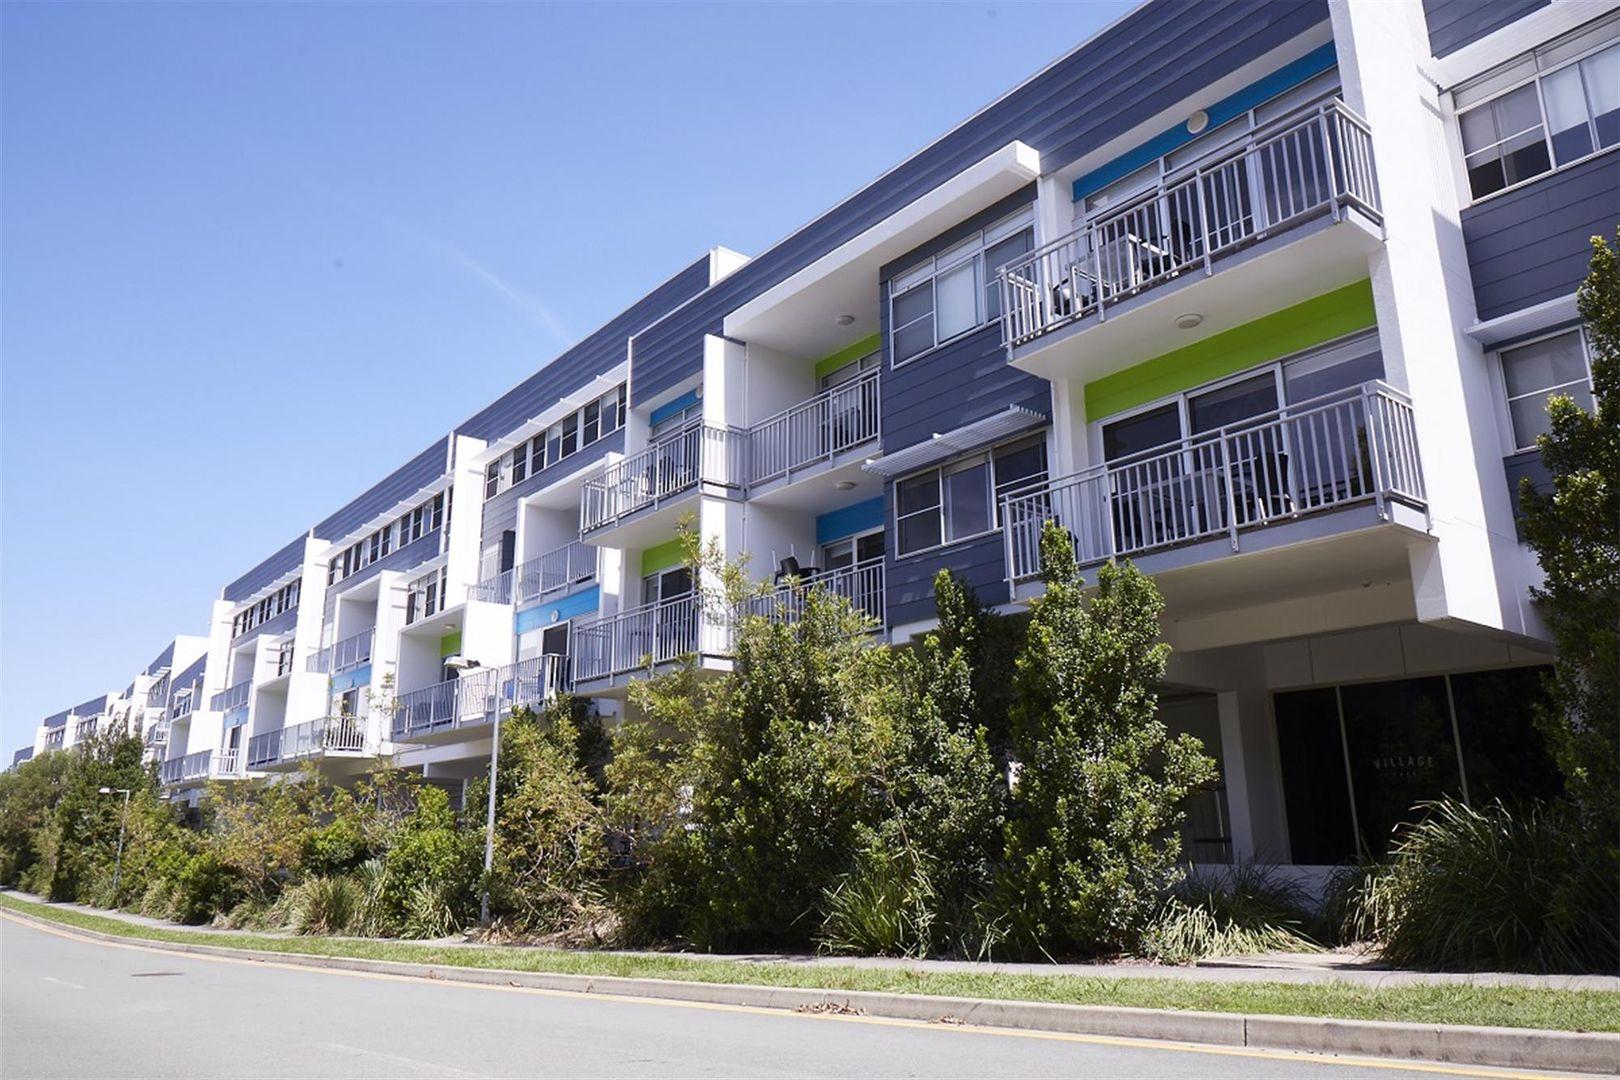 0/1 Griffith University Village Village Road, Southport QLD 4215, Image 0